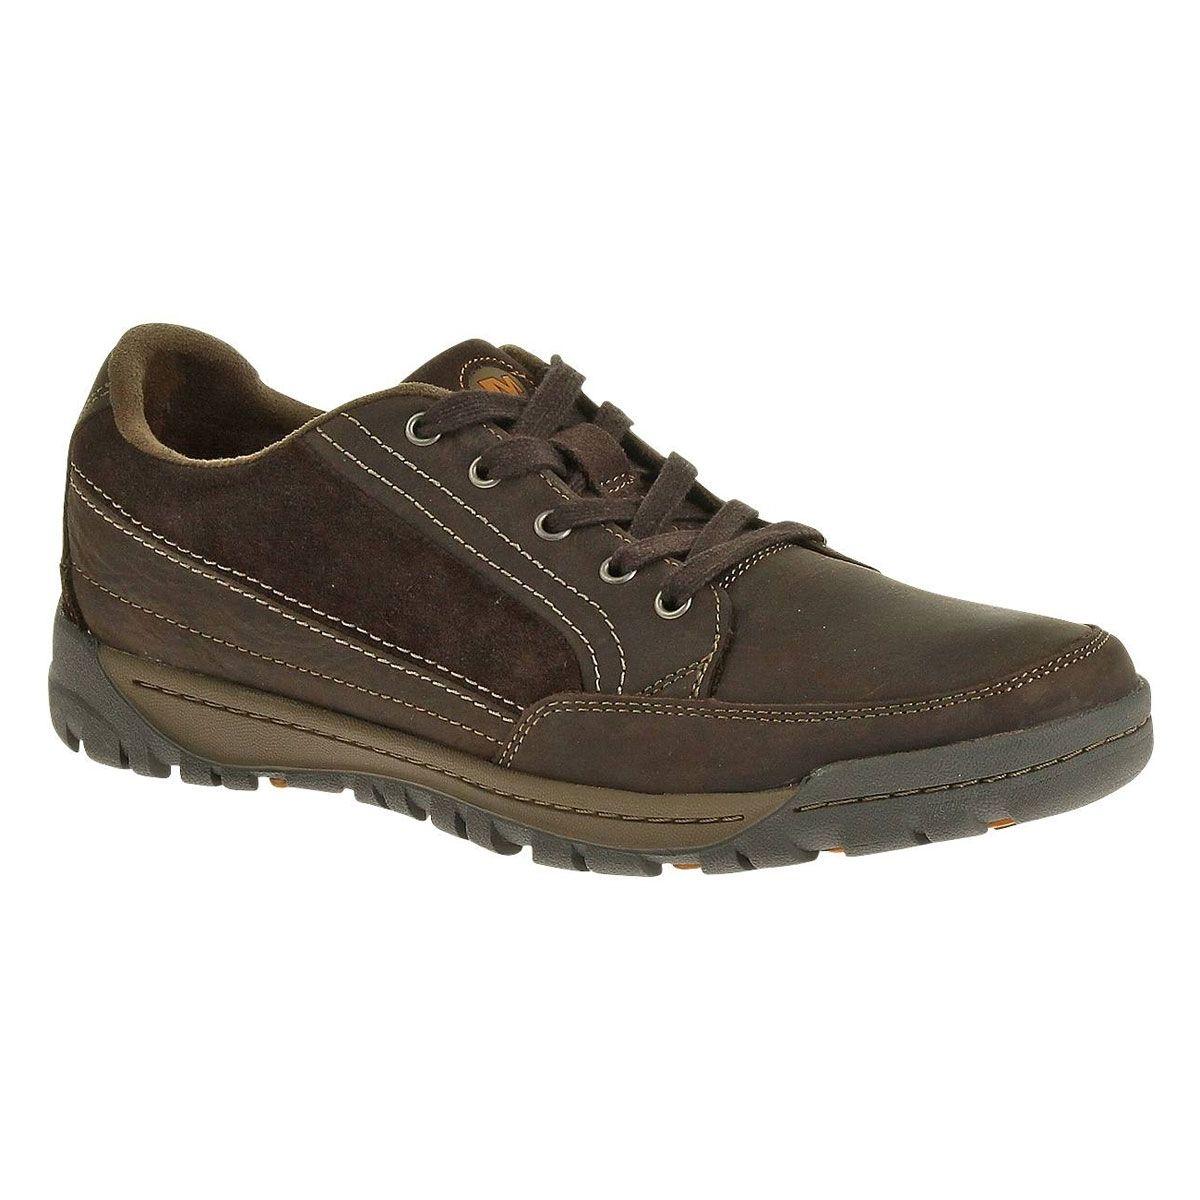 Image of Merrell Traveler Sphere Shoes (Men's) - Espresso